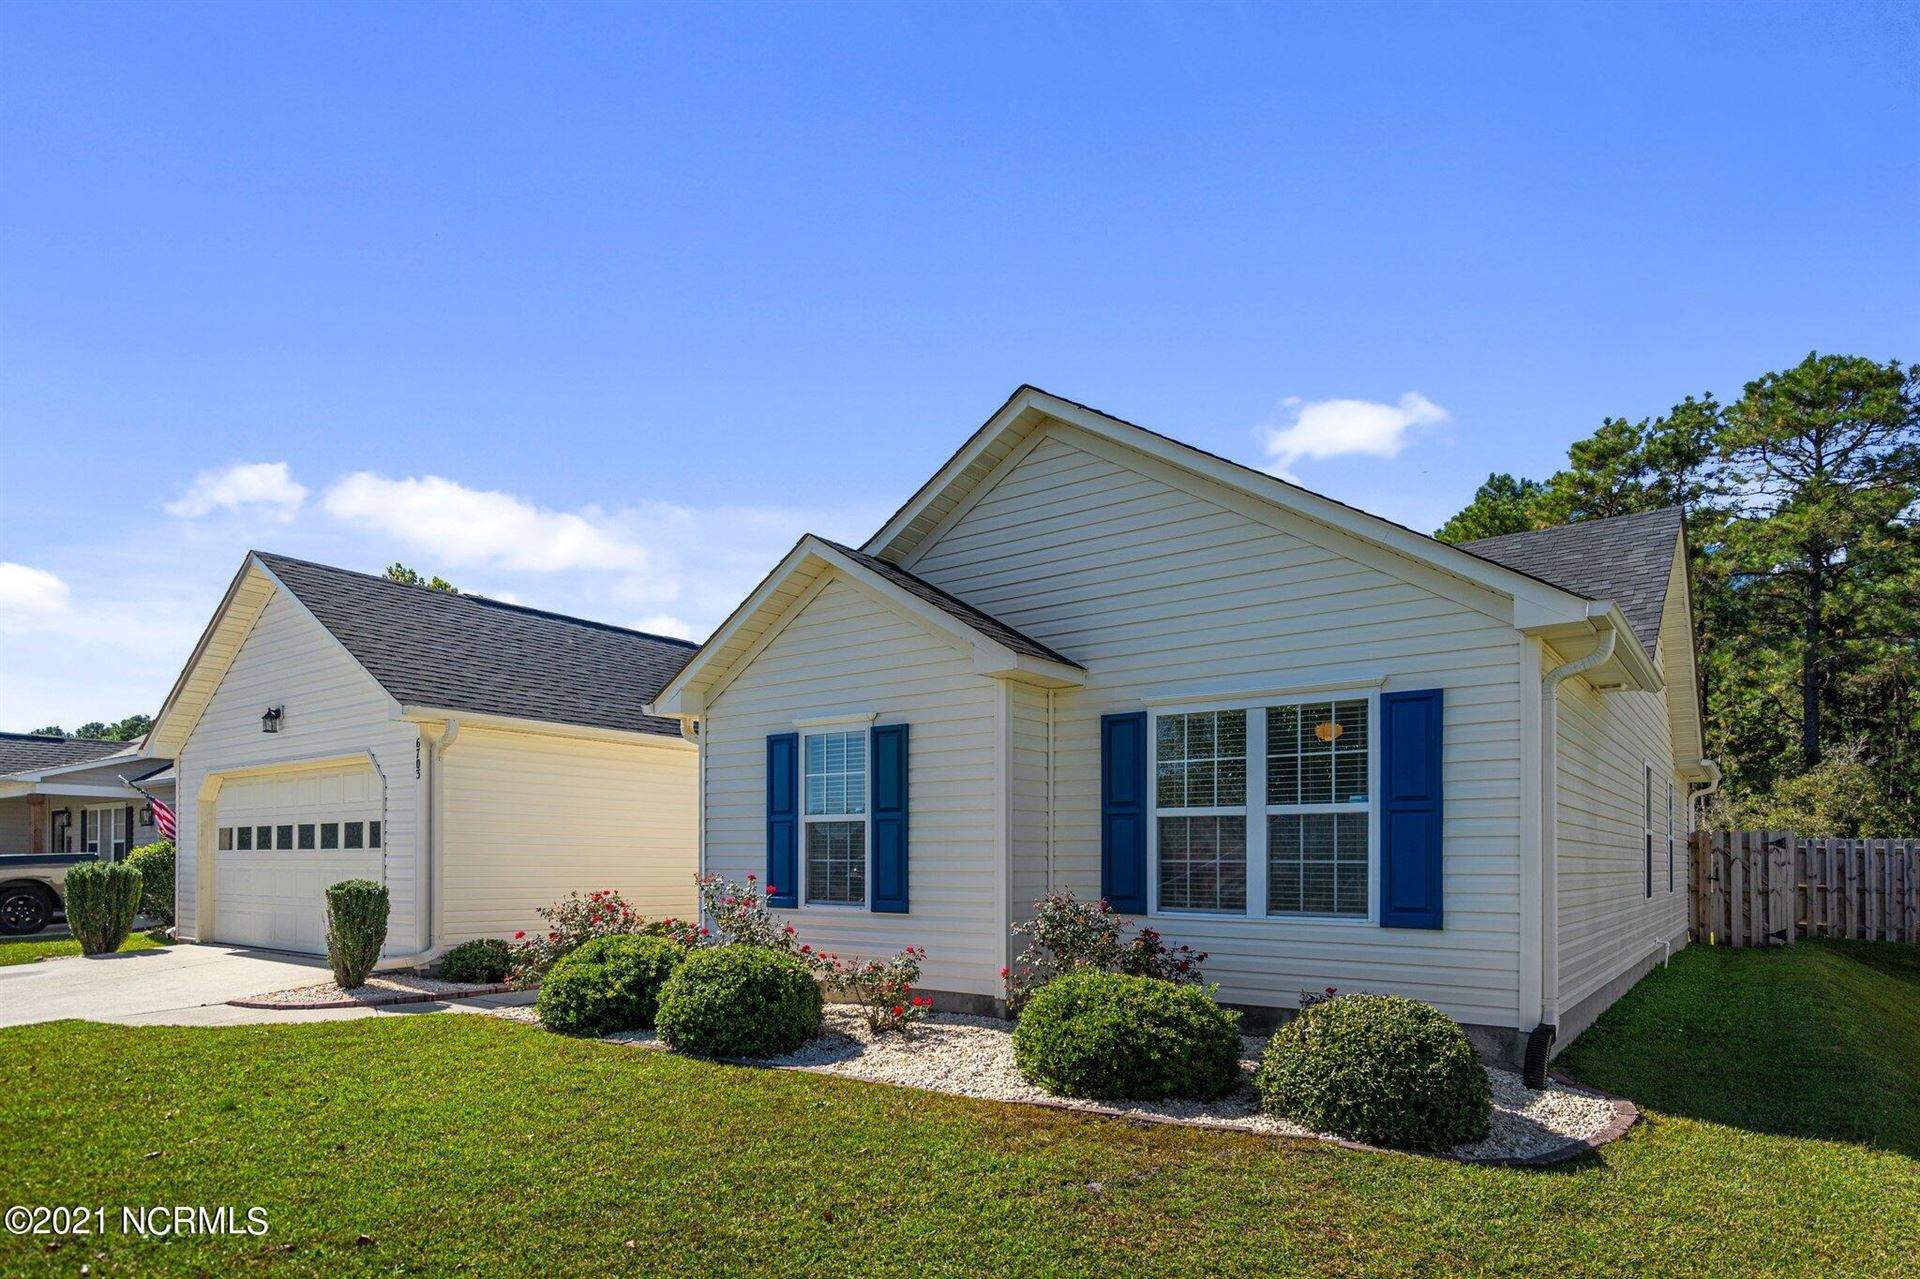 Photo of 6703 Yellow Bell Road, Wilmington, NC 28411 (MLS # 100295523)